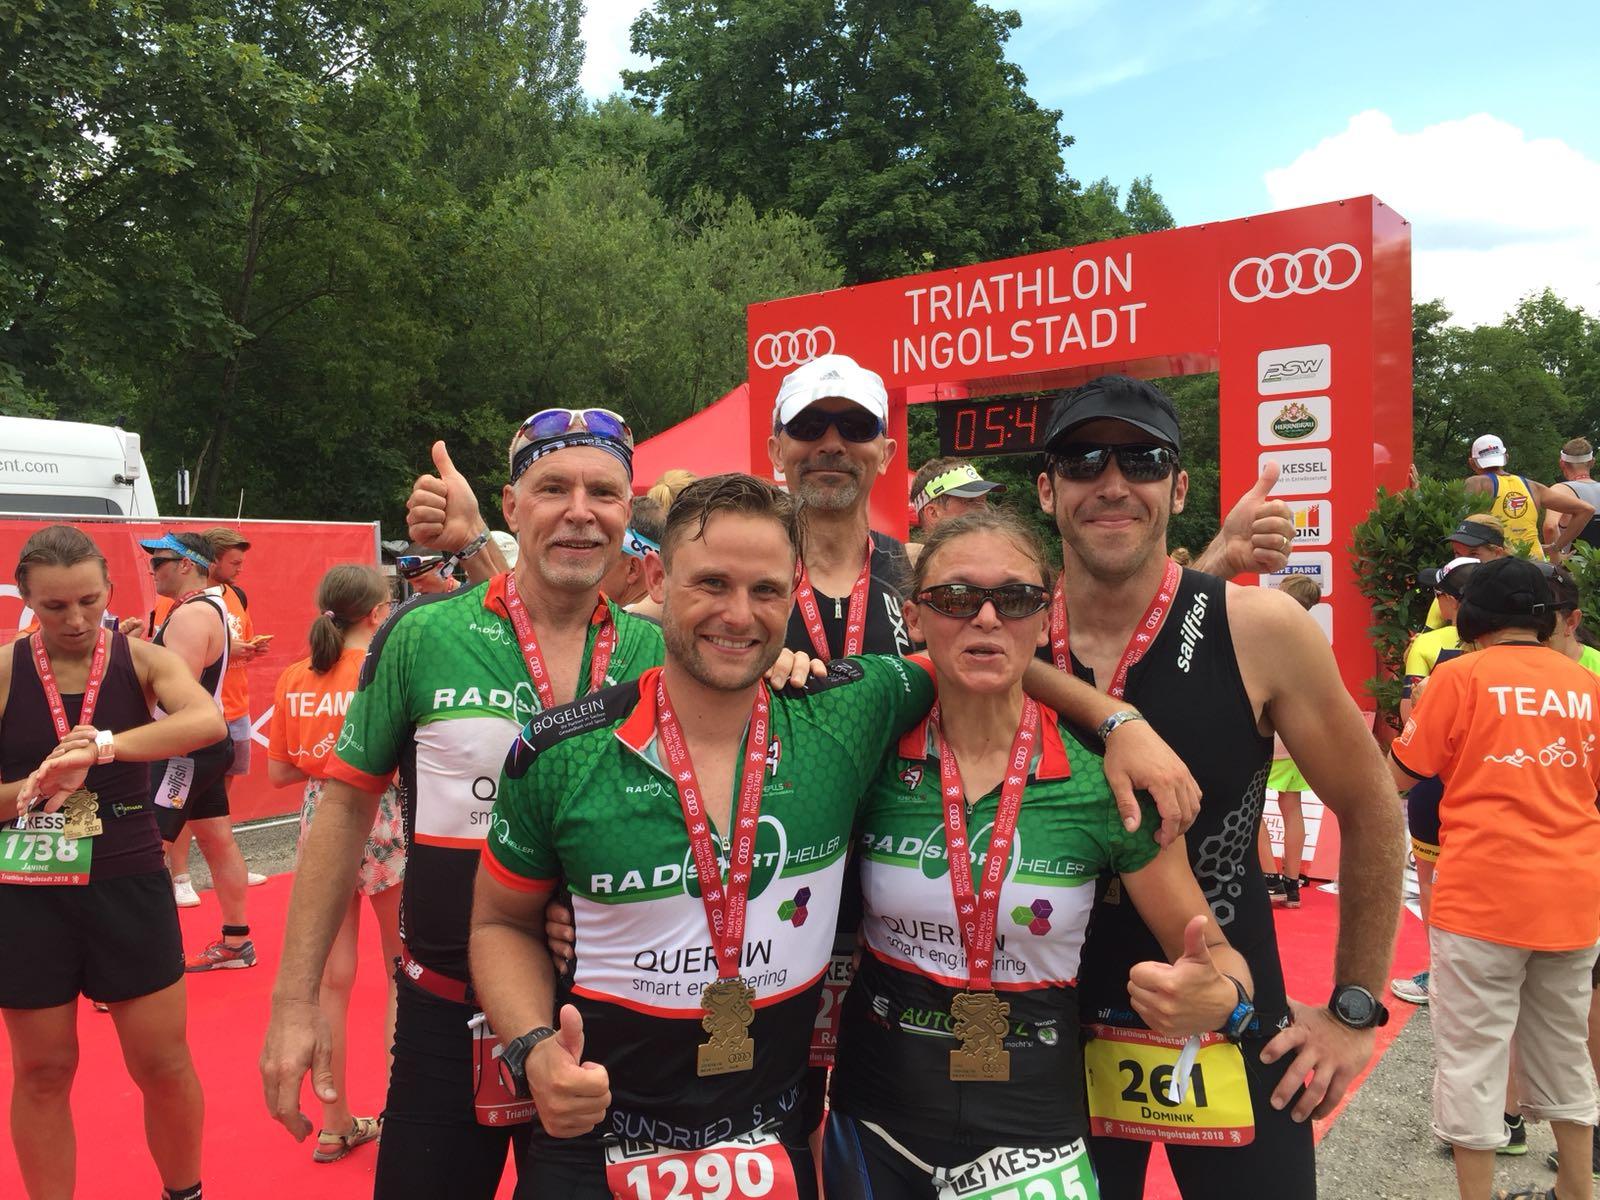 IMG-20180610-WA0018_Triathlon_Ingolstadt